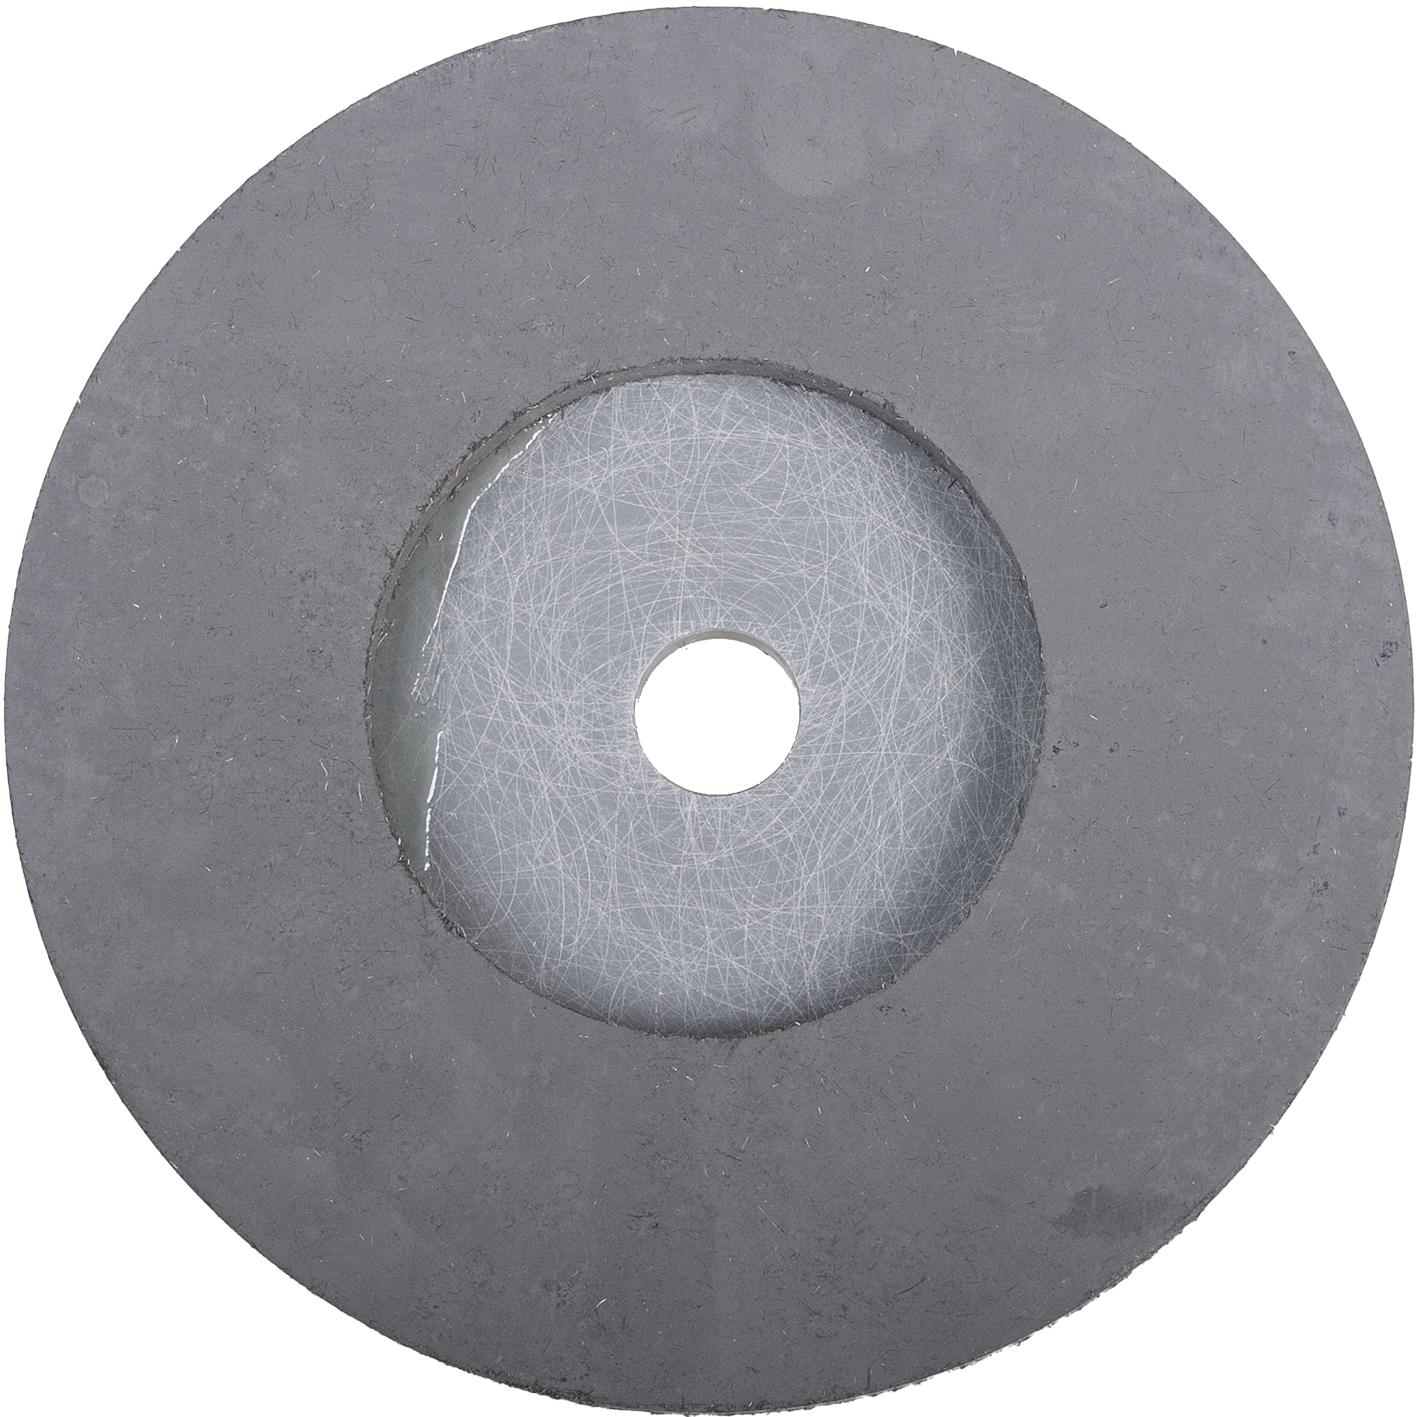 Diamantschleifteller OCTRON ø 250 mm │ Klett │ BUFF